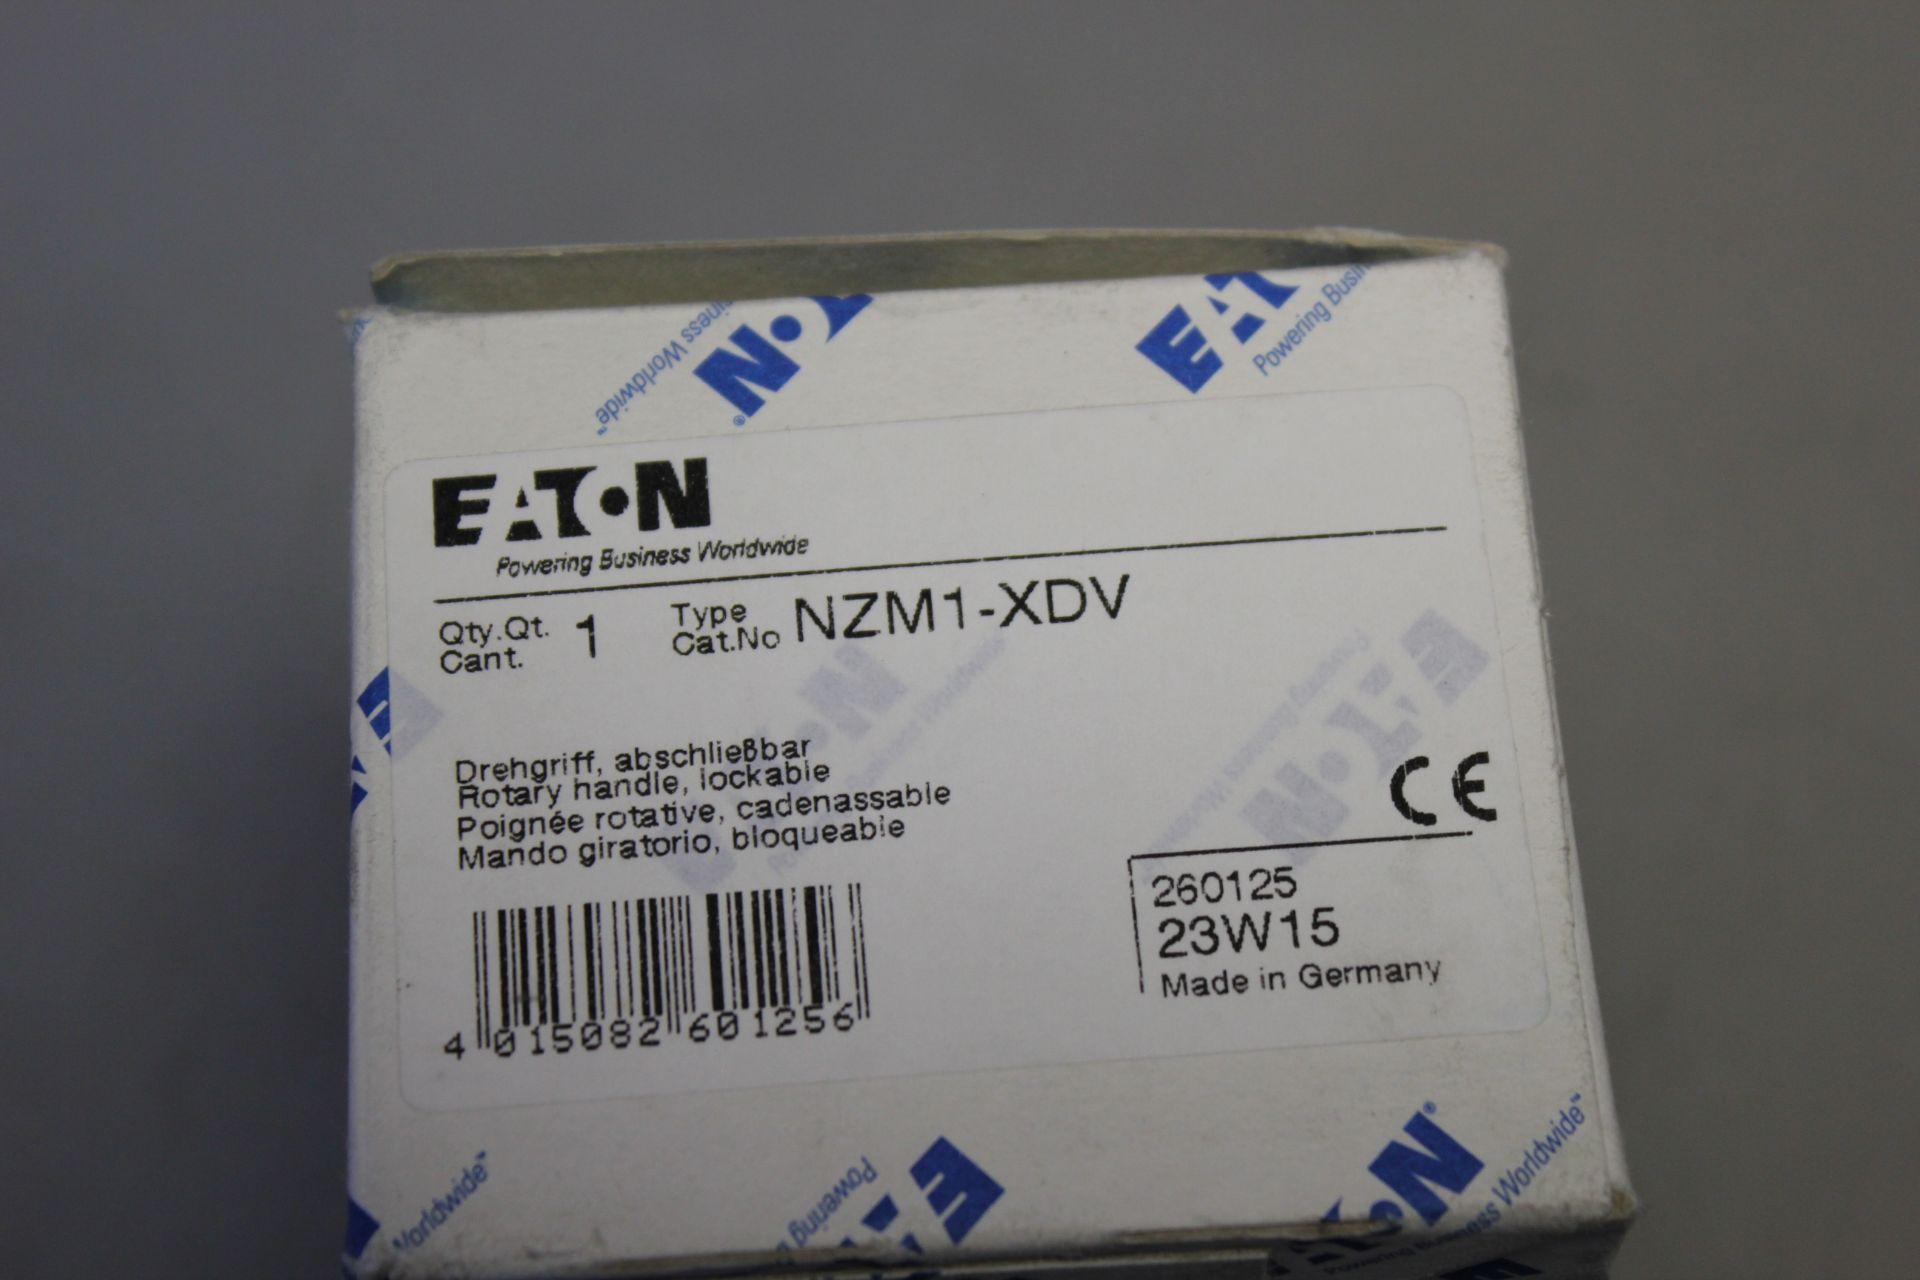 NEW EATON ROTARY HANDLE - Image 2 of 3